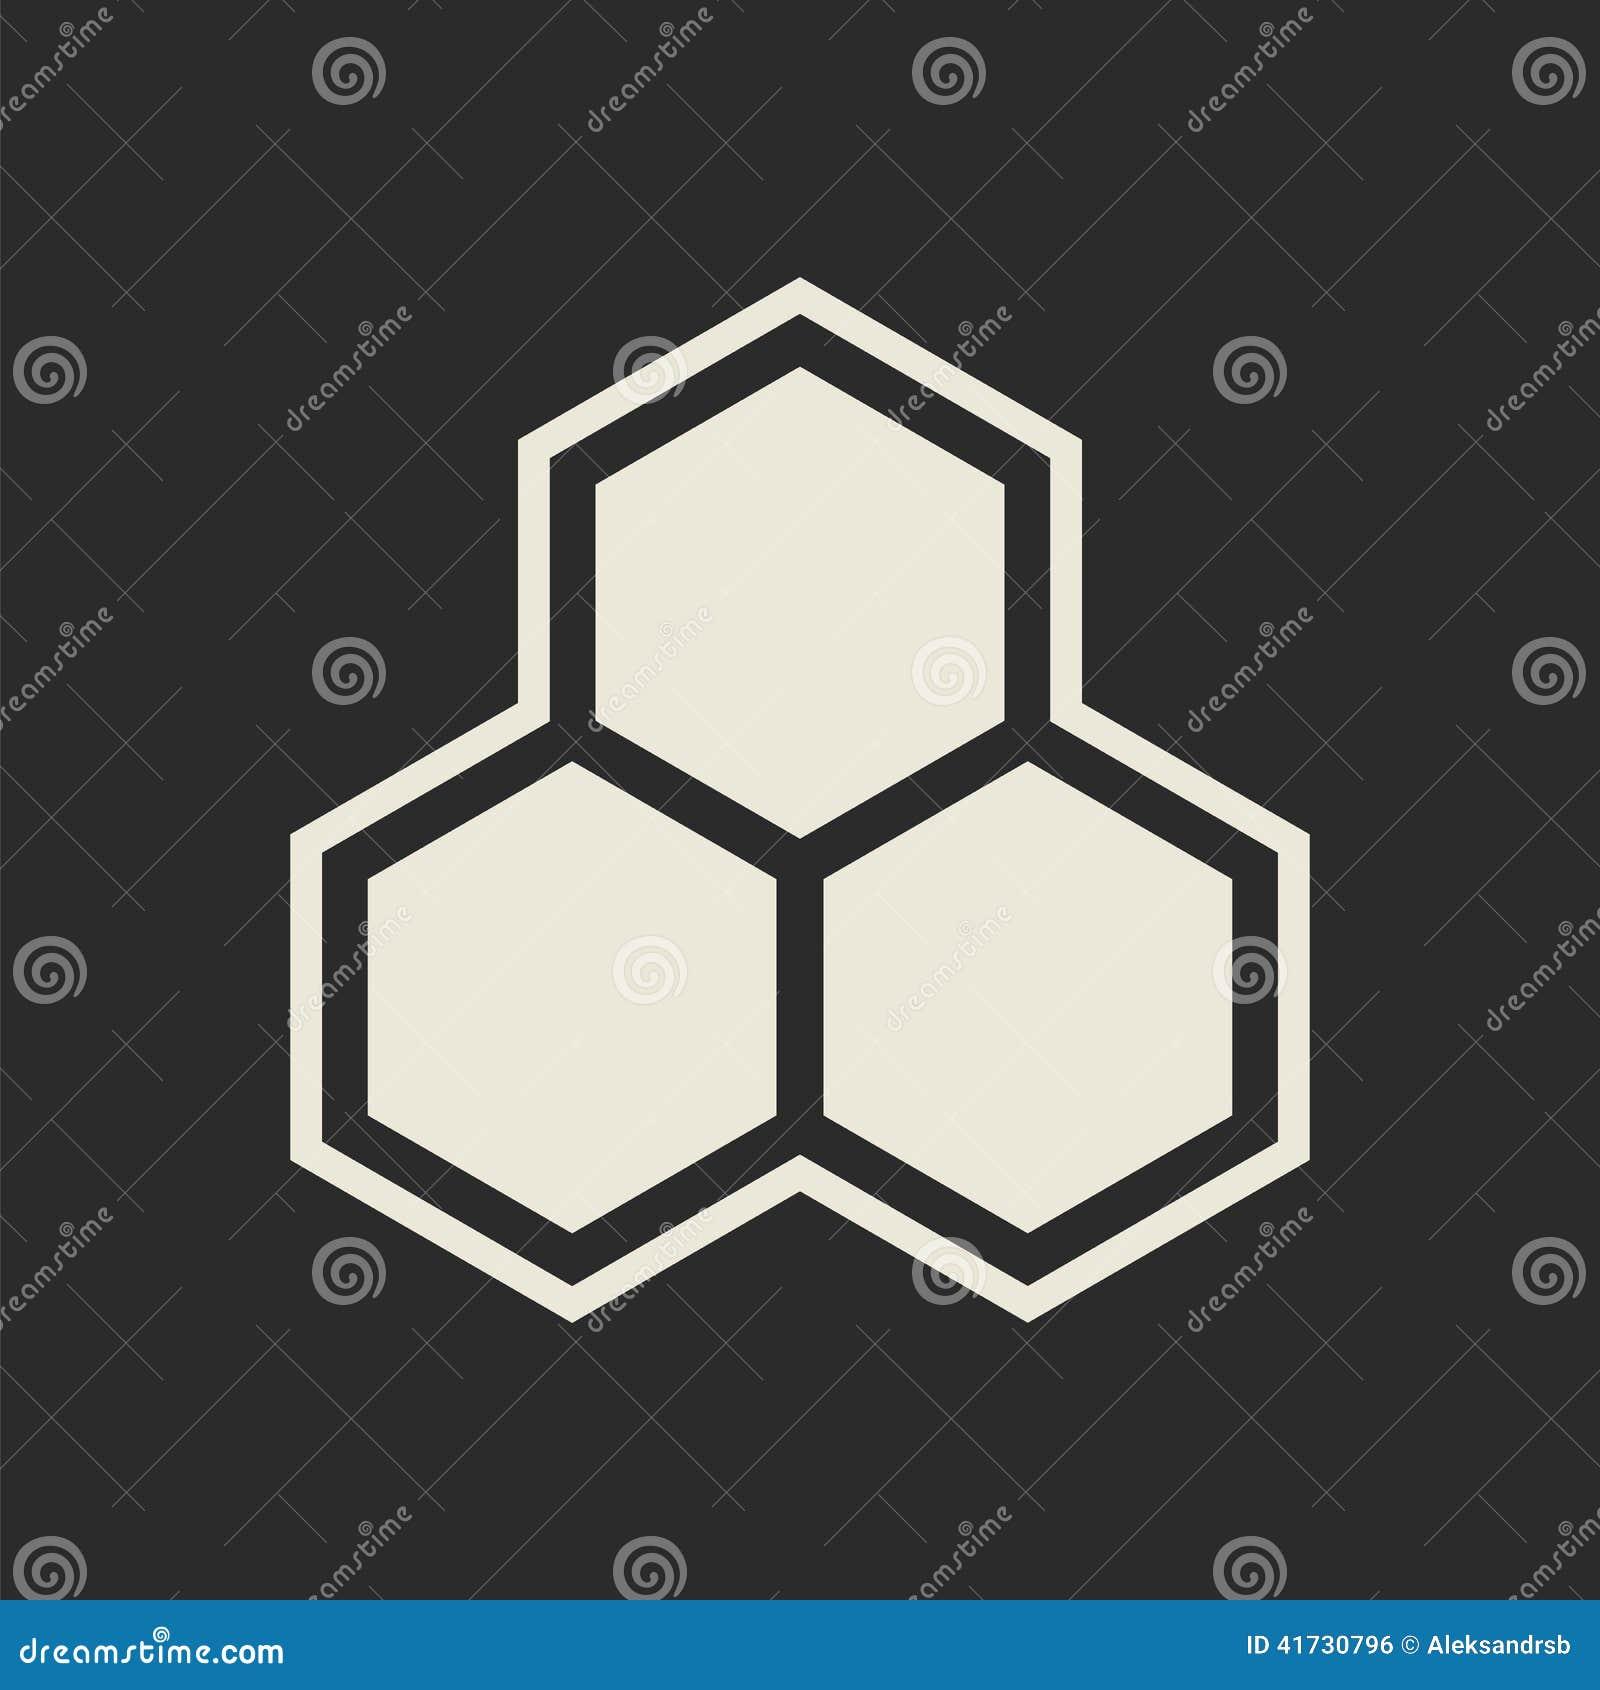 Ic ne d 39 hexagone nid d 39 abeilles illustration stock image for Carrelage nid d abeille